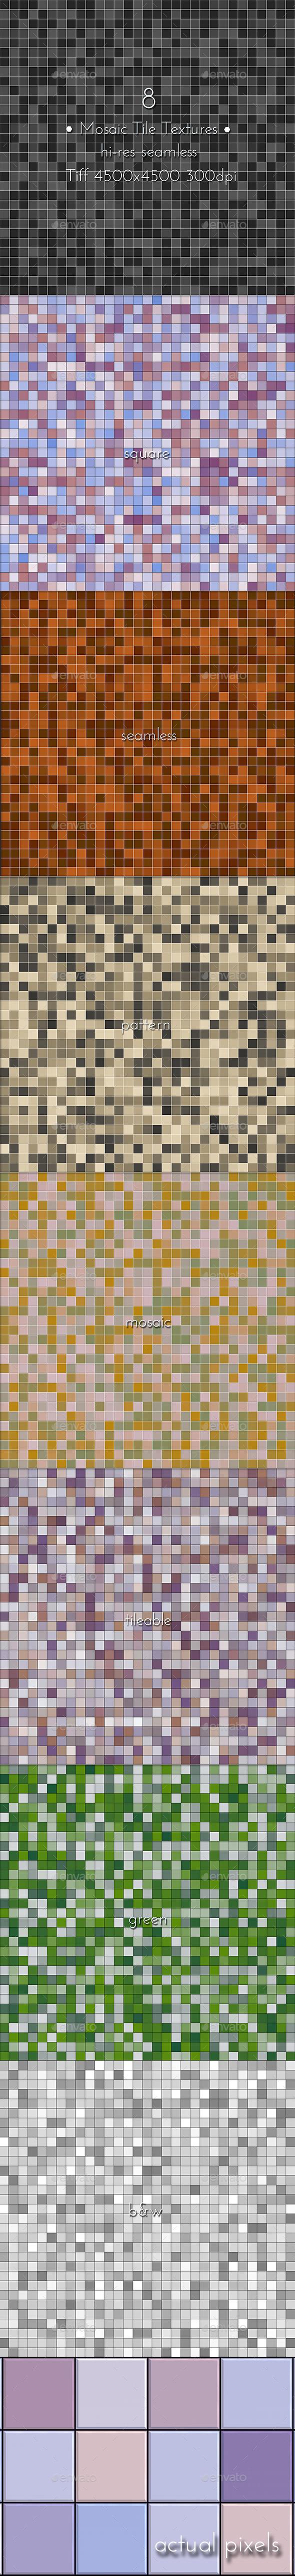 Mosaic Tile Textures - Miscellaneous Textures